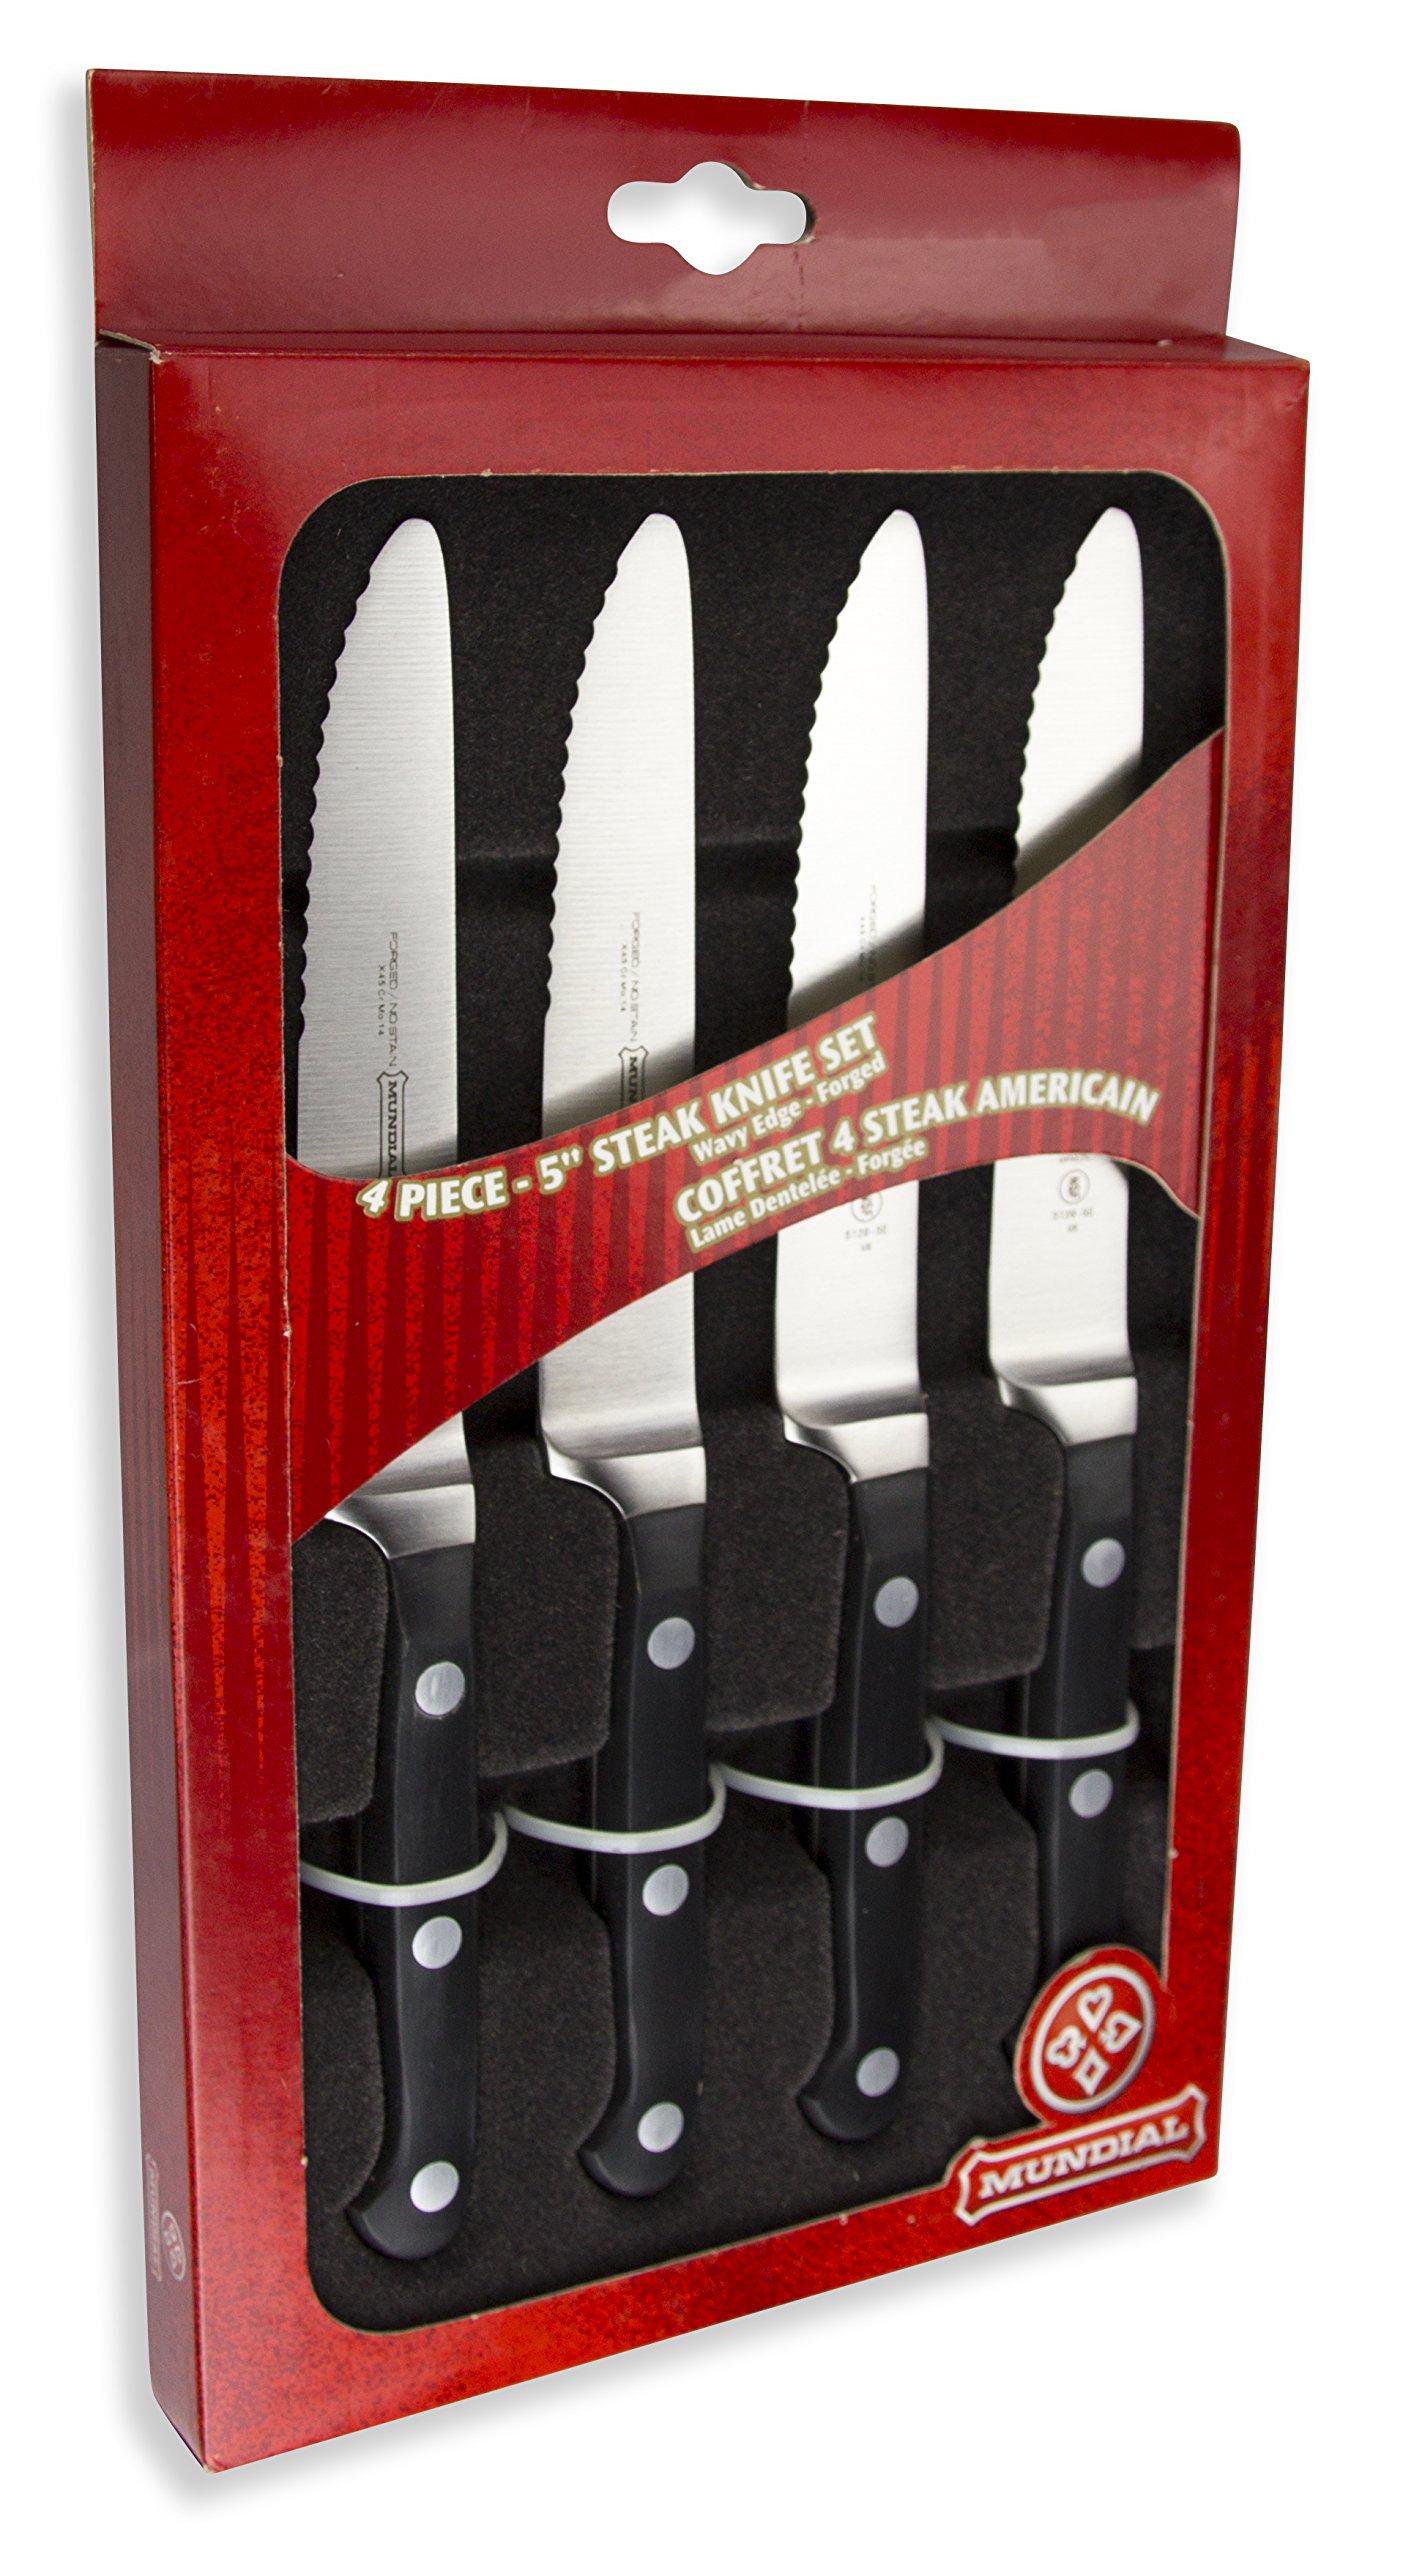 Mundial 5100 Series 4-Piece 5'' Serrated-Edge Steak Knife Set, Black